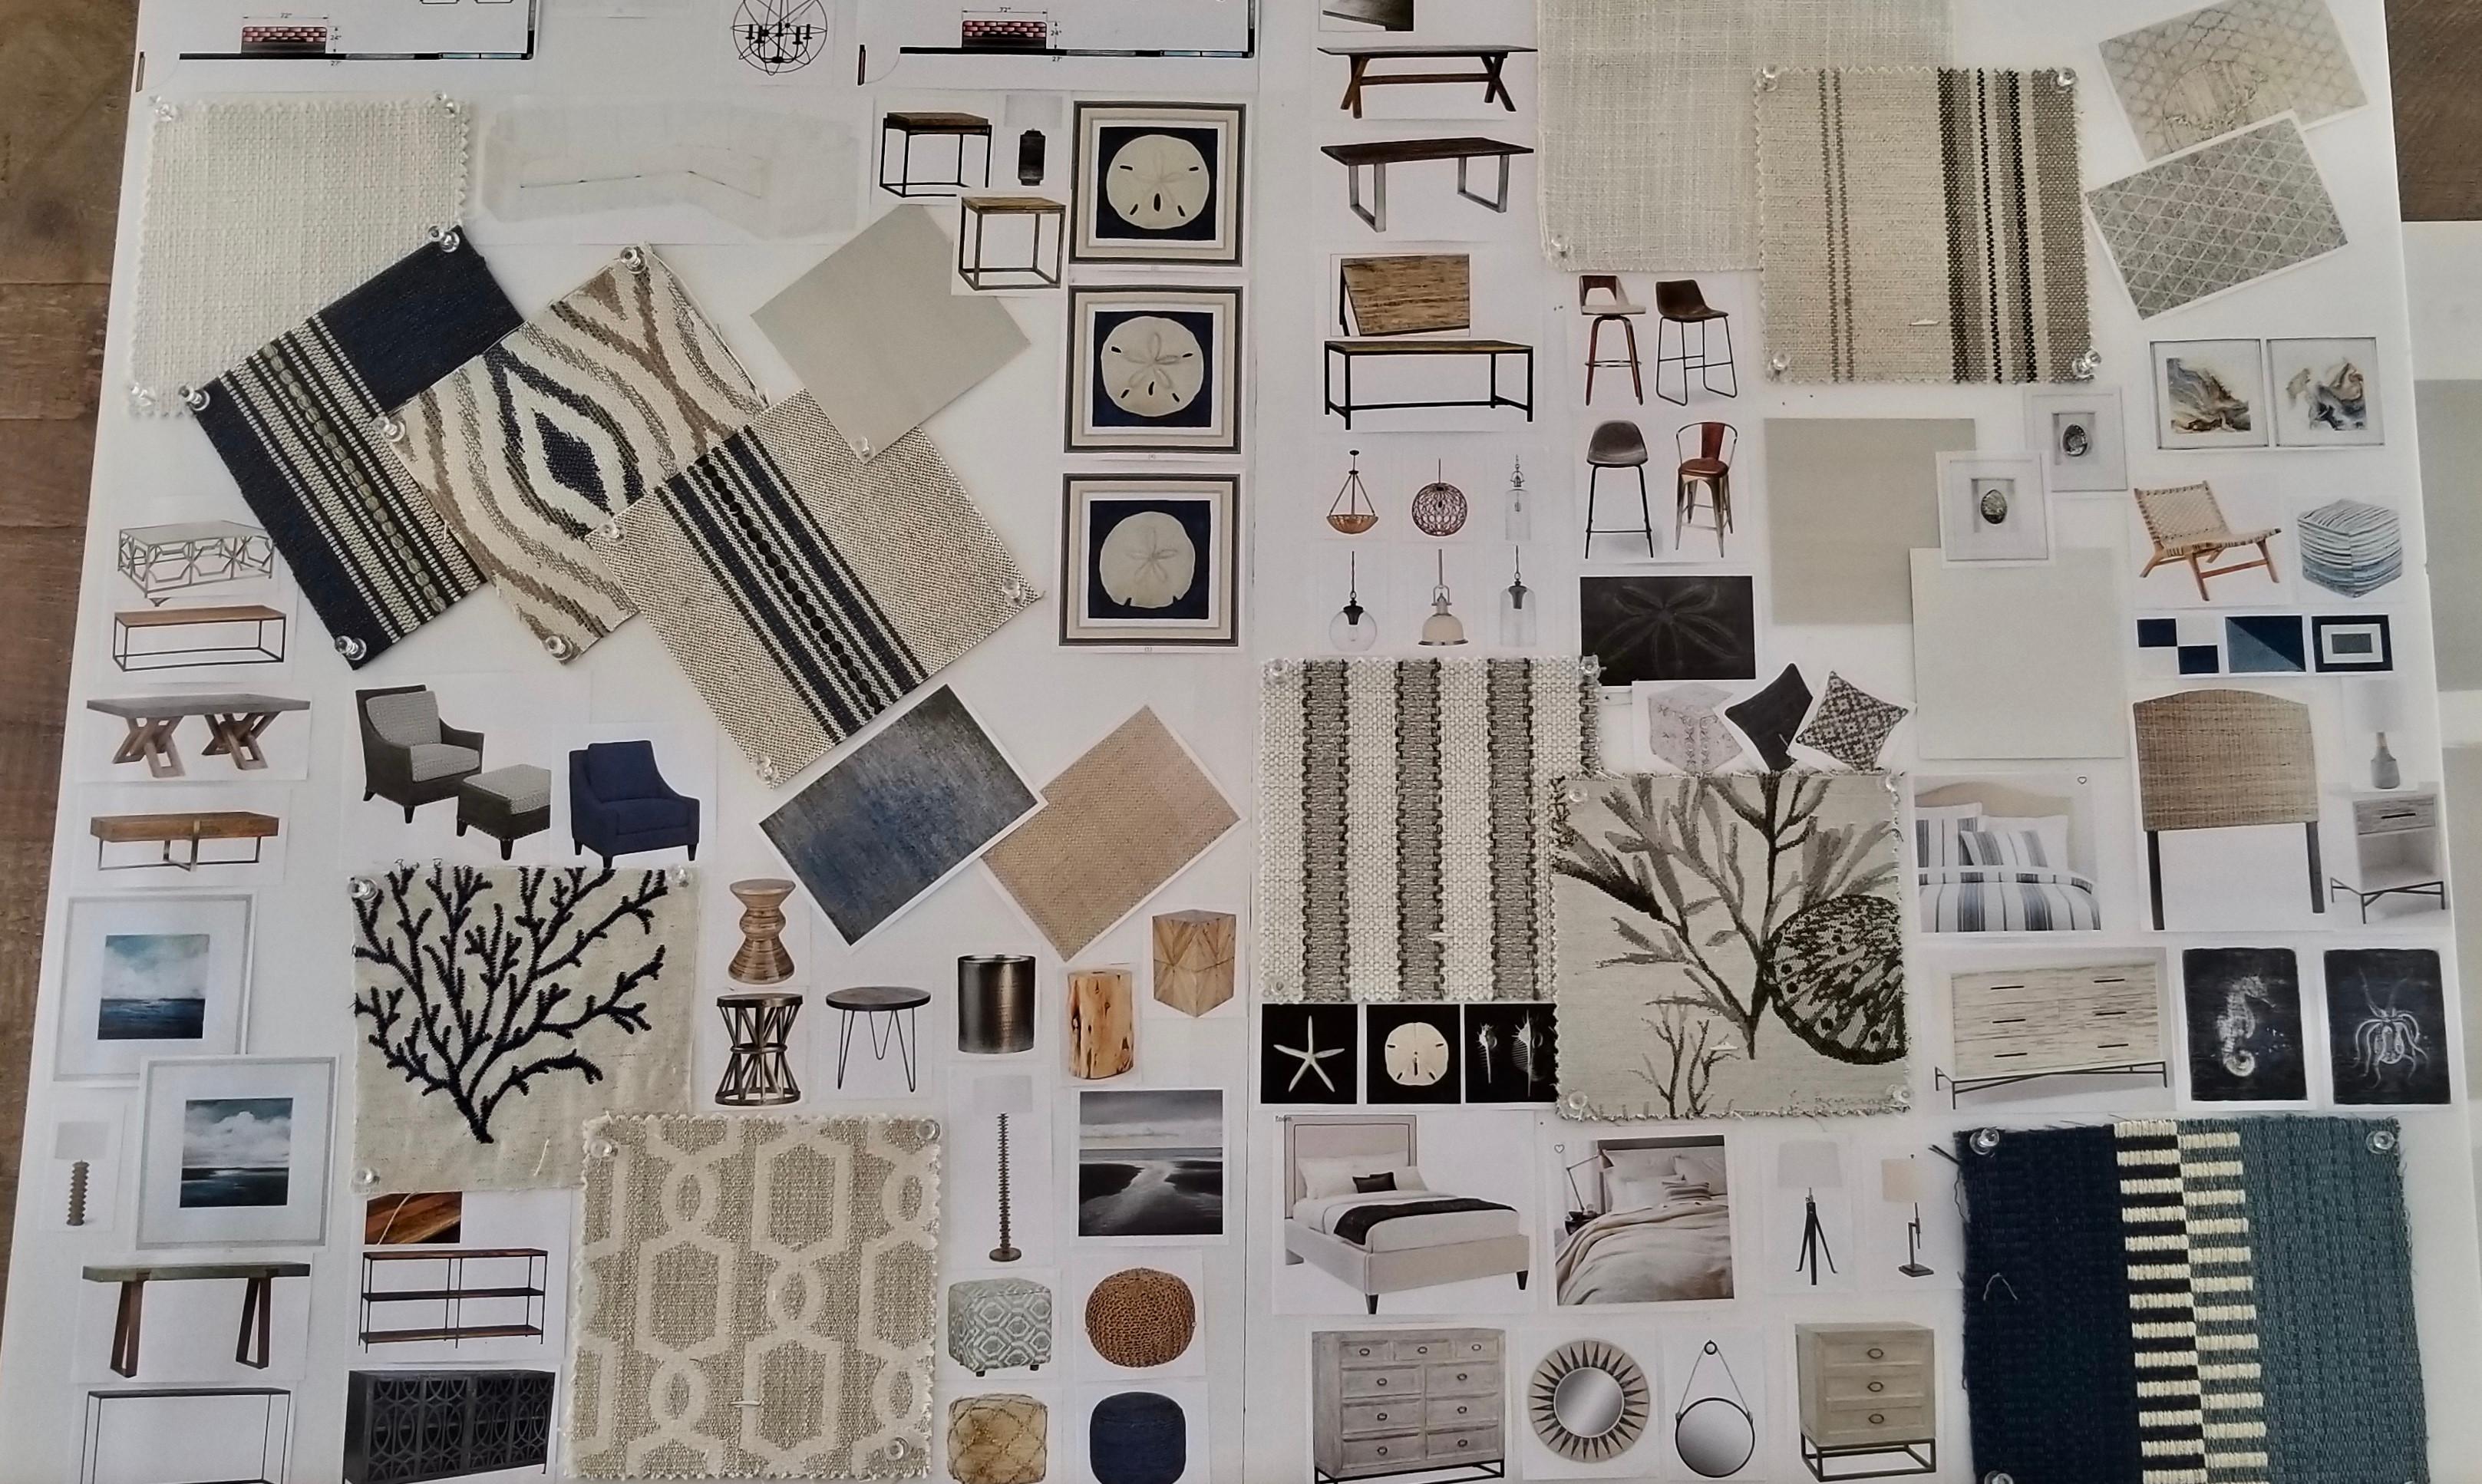 Residential Interior Design Board